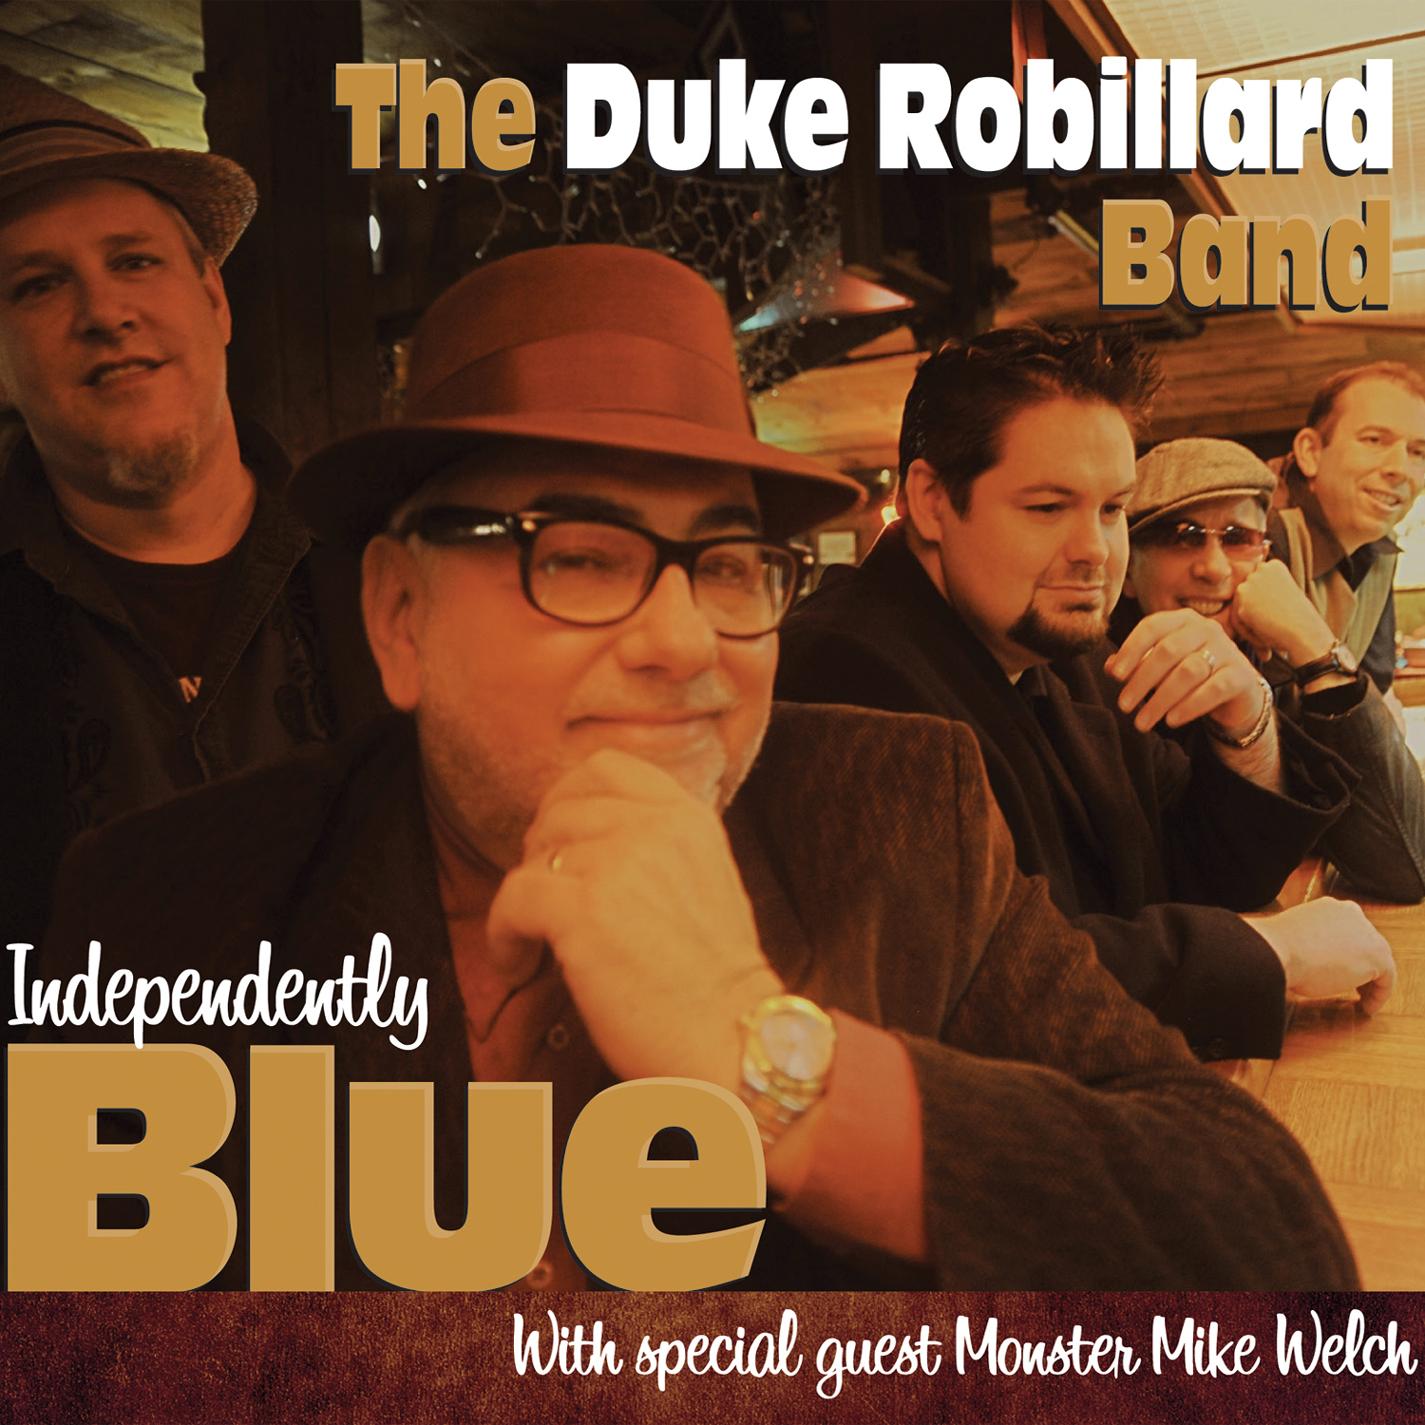 Independently Blue by Duke Robillard